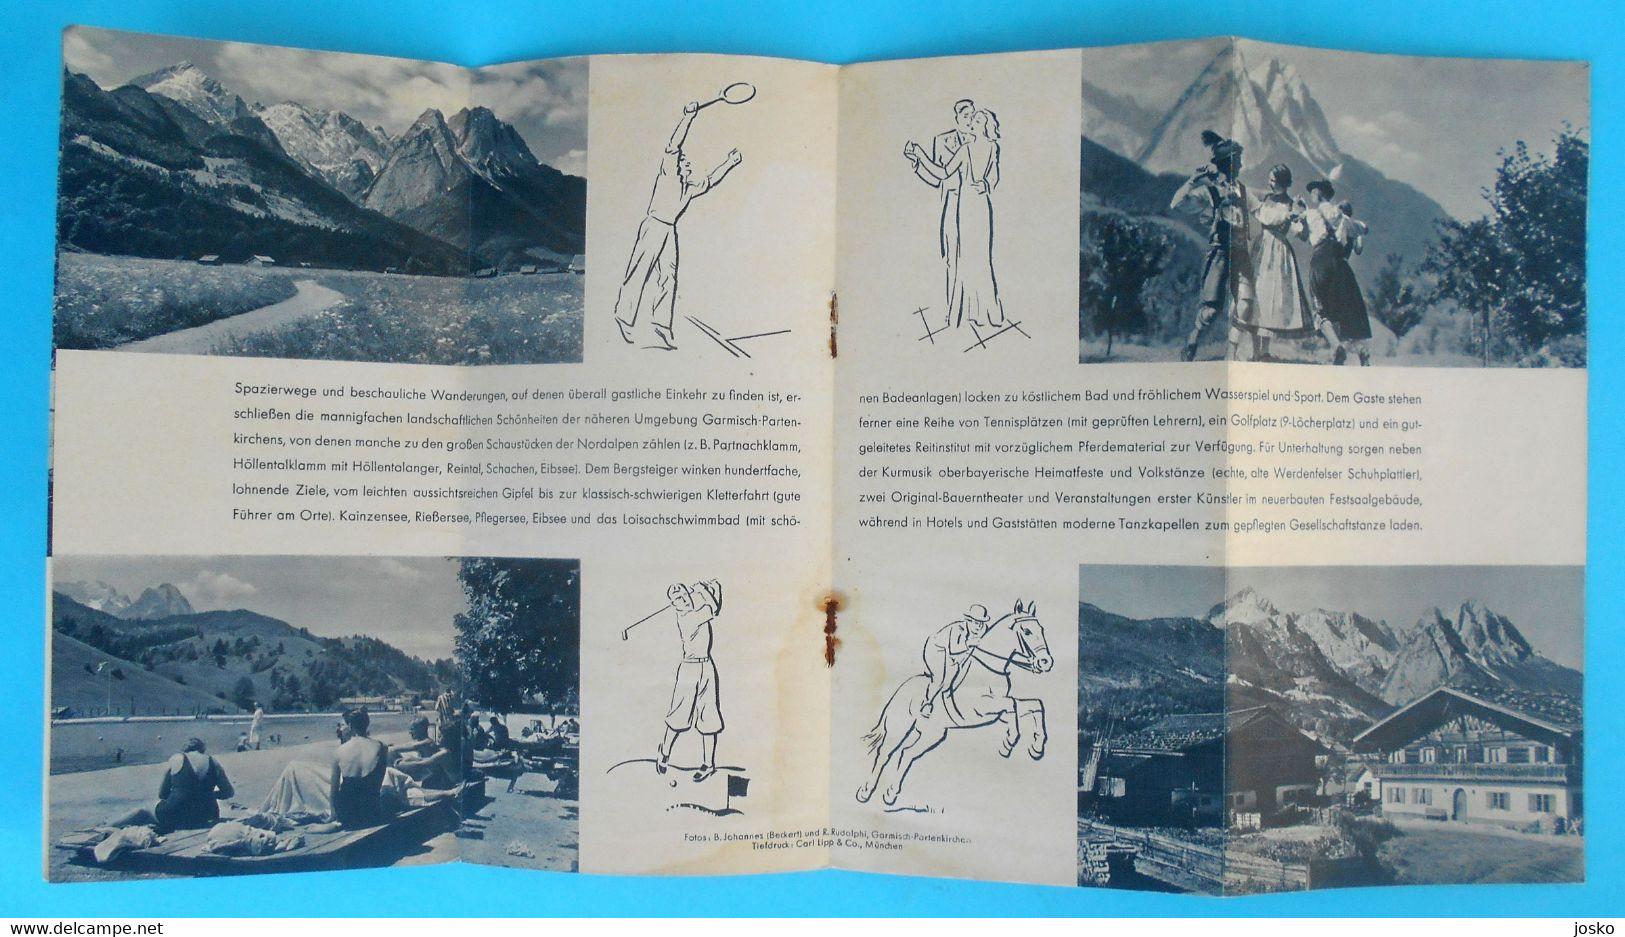 WINTER OLYMPIC GAMES GARMISCH-PARTENKIRCHEN 1936 - Old Brochure * Olympiad Olympiade Olympia Olimpici Germany - Olympische Spelen